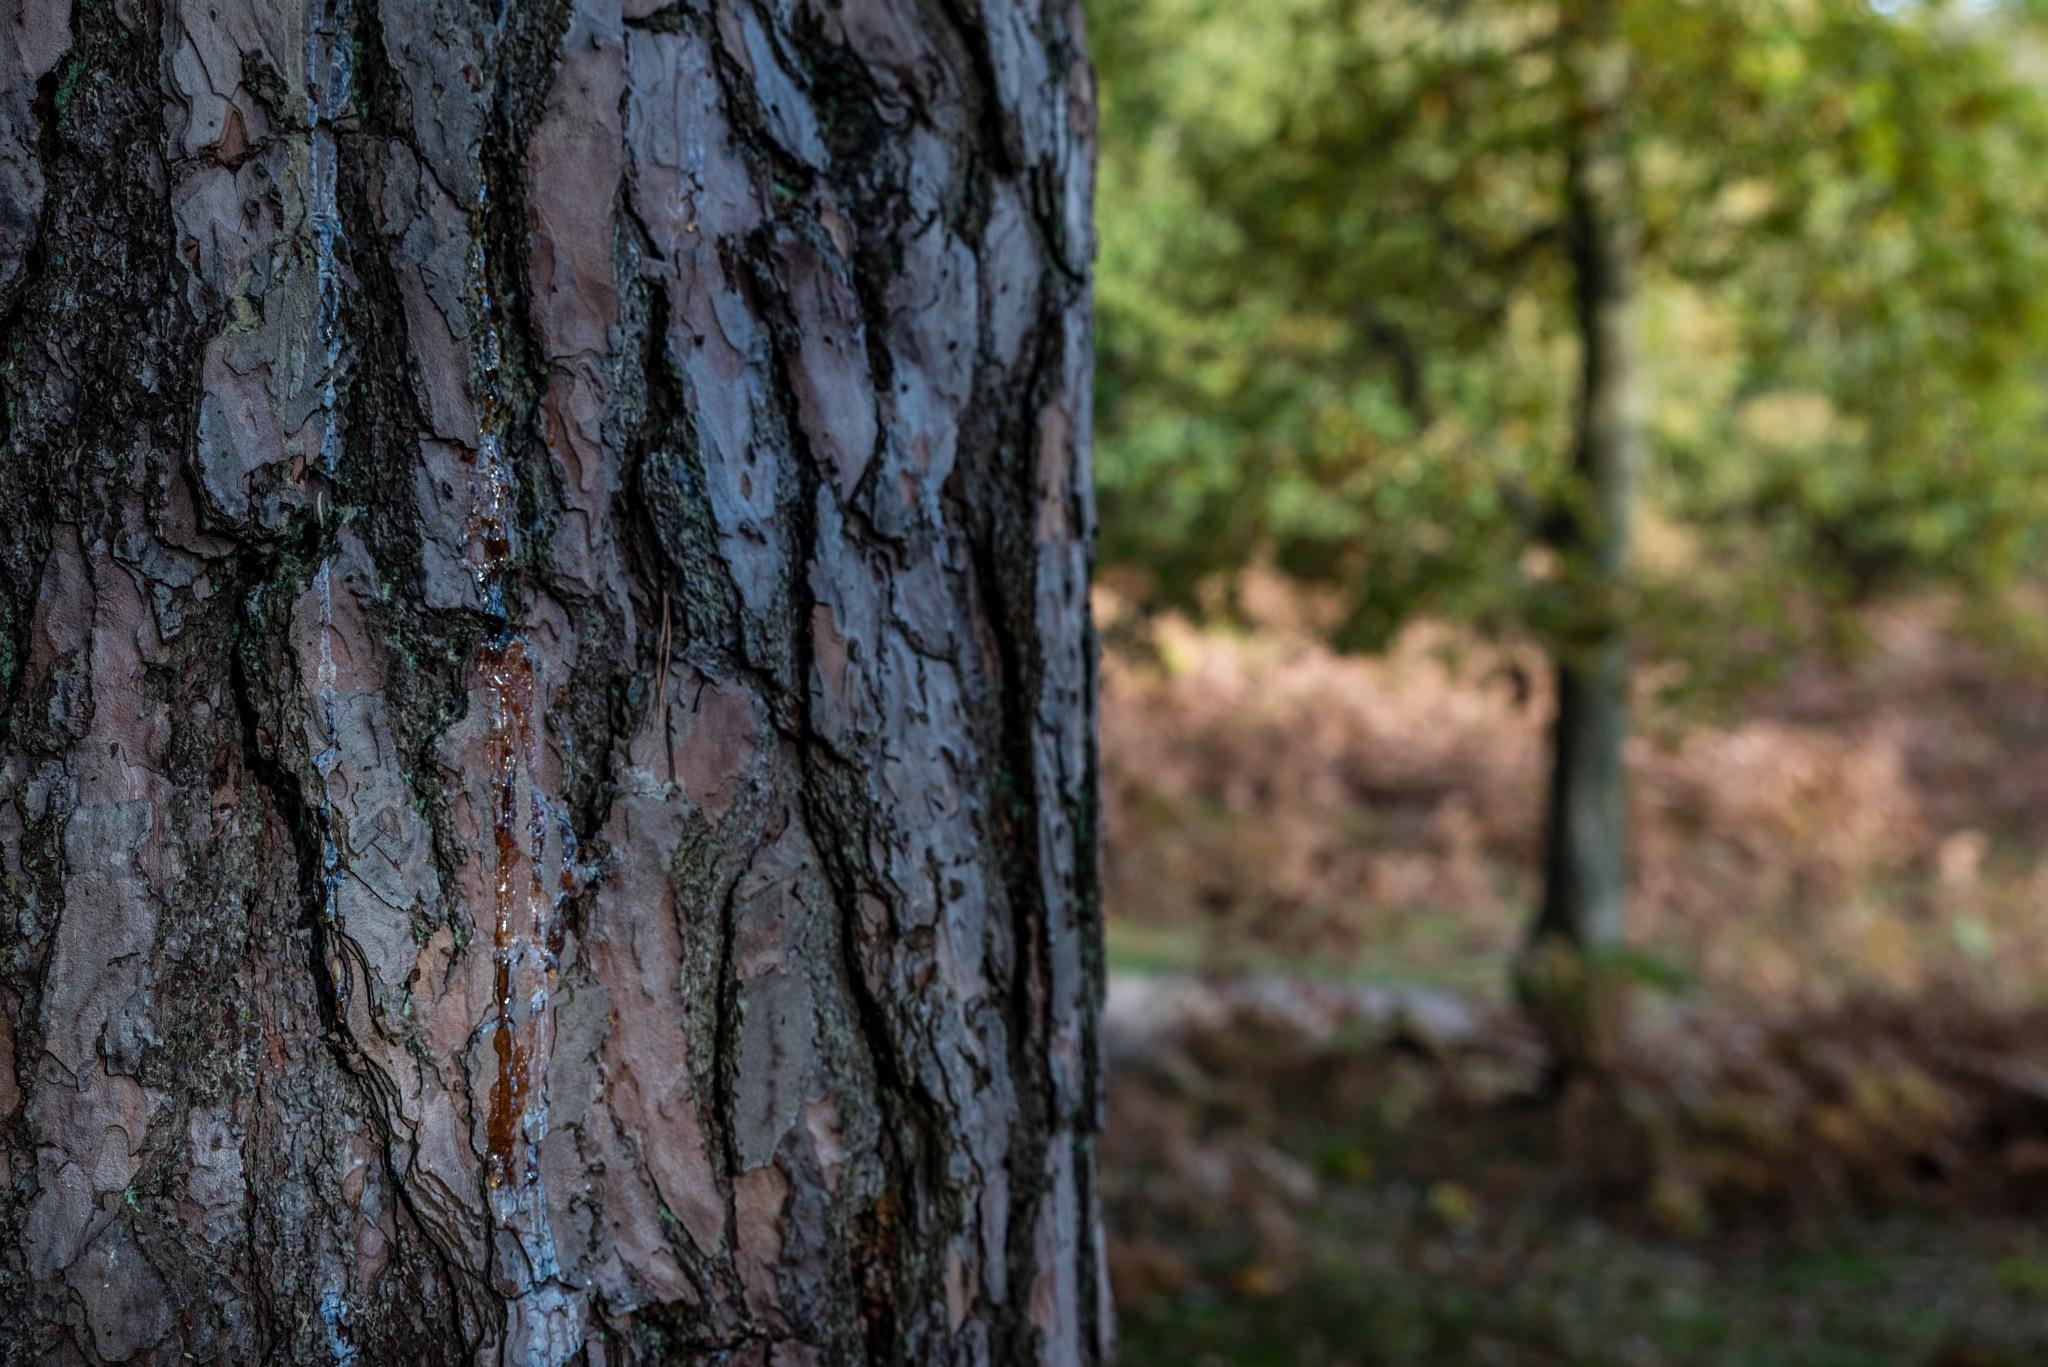 Weeping tree by Stephen Hammond